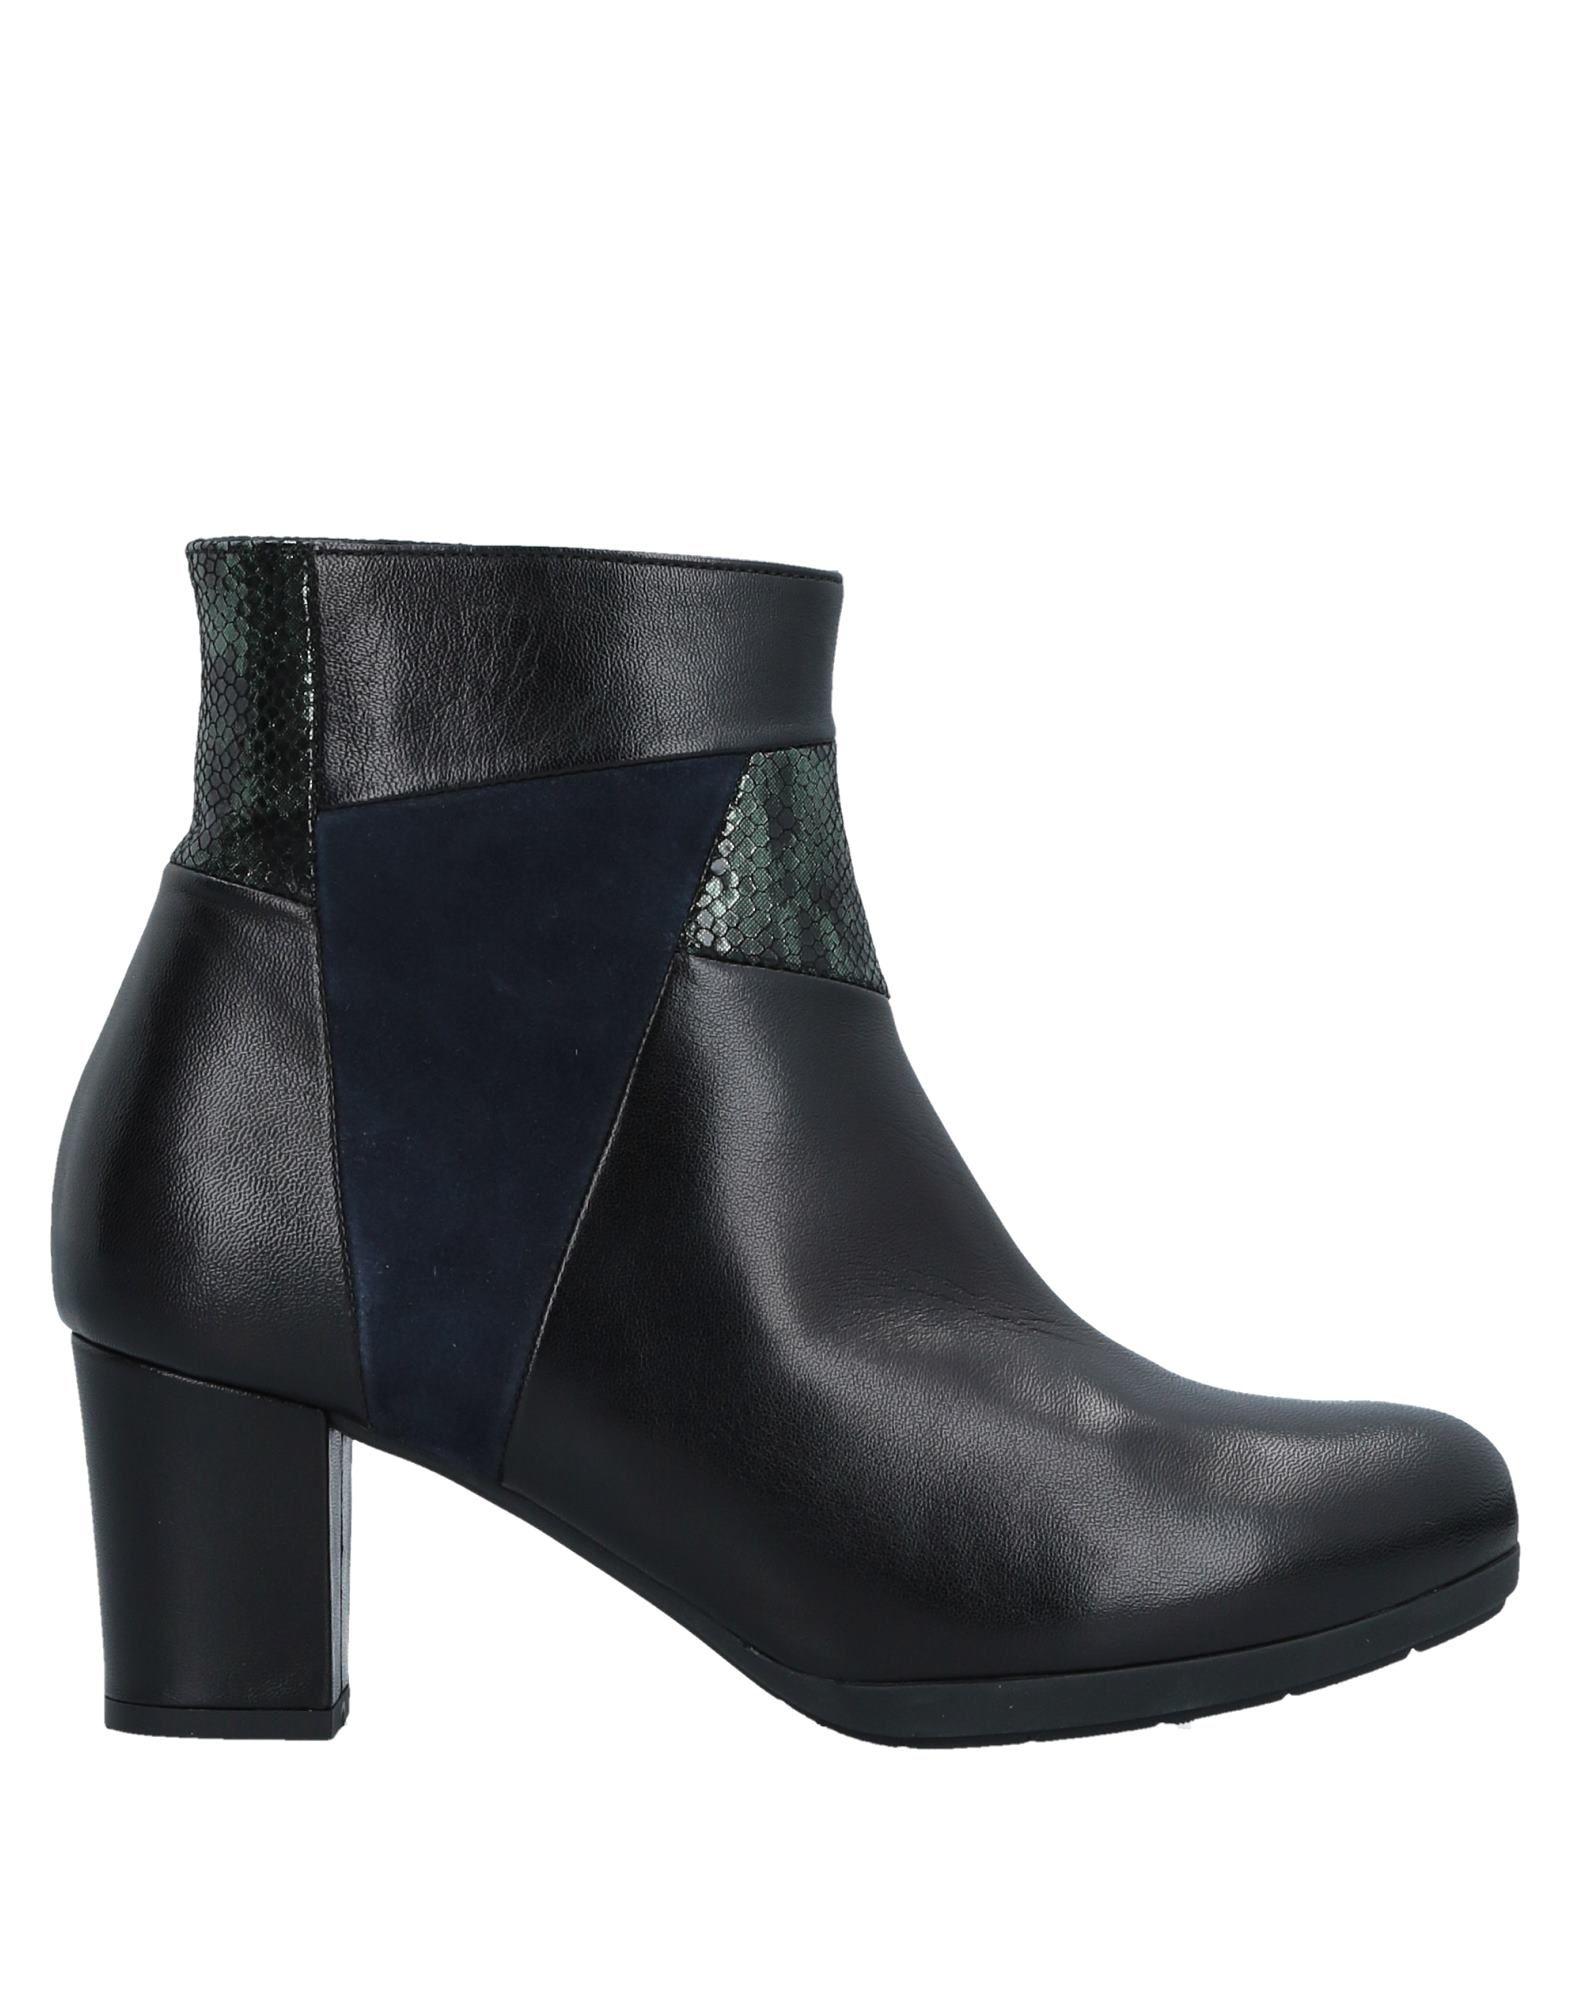 Mot 11516166AE Gute Qualität beliebte Schuhe